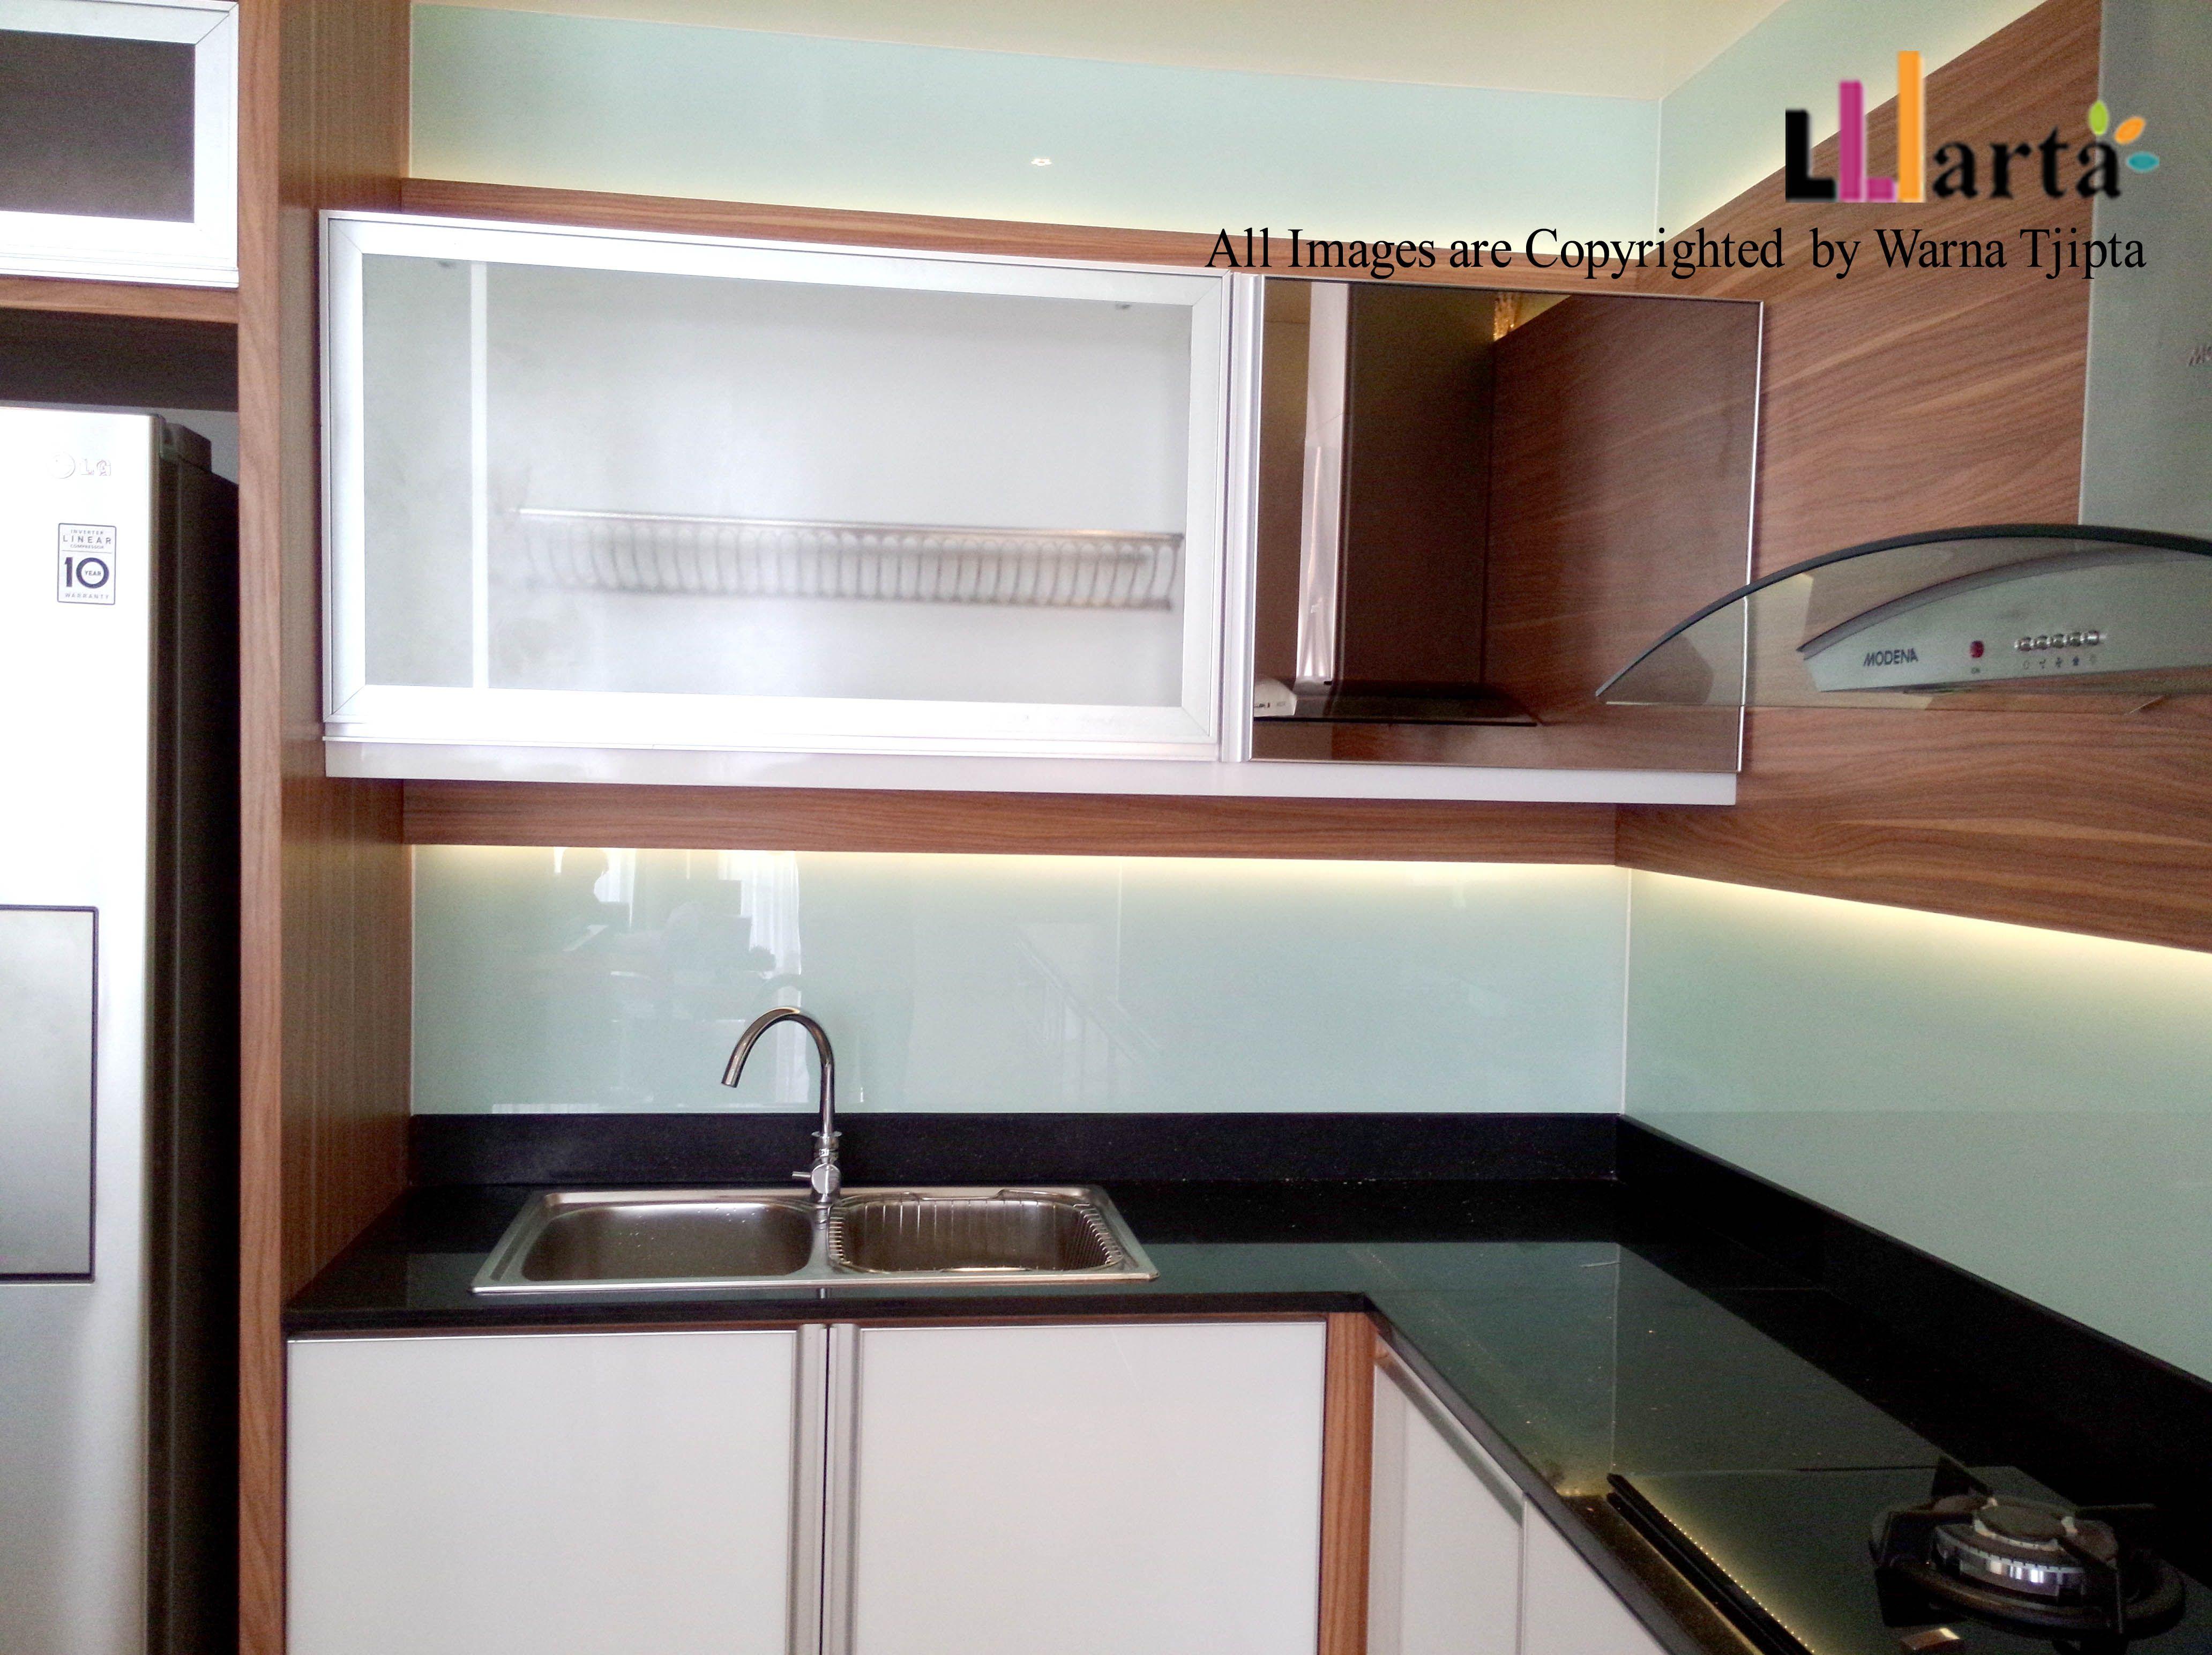 Kitchen set mr sukandar modernkitchenset kitchen hpl duco platerack hydrolic sink modena hpl glasstone warmwhite indirect lighting